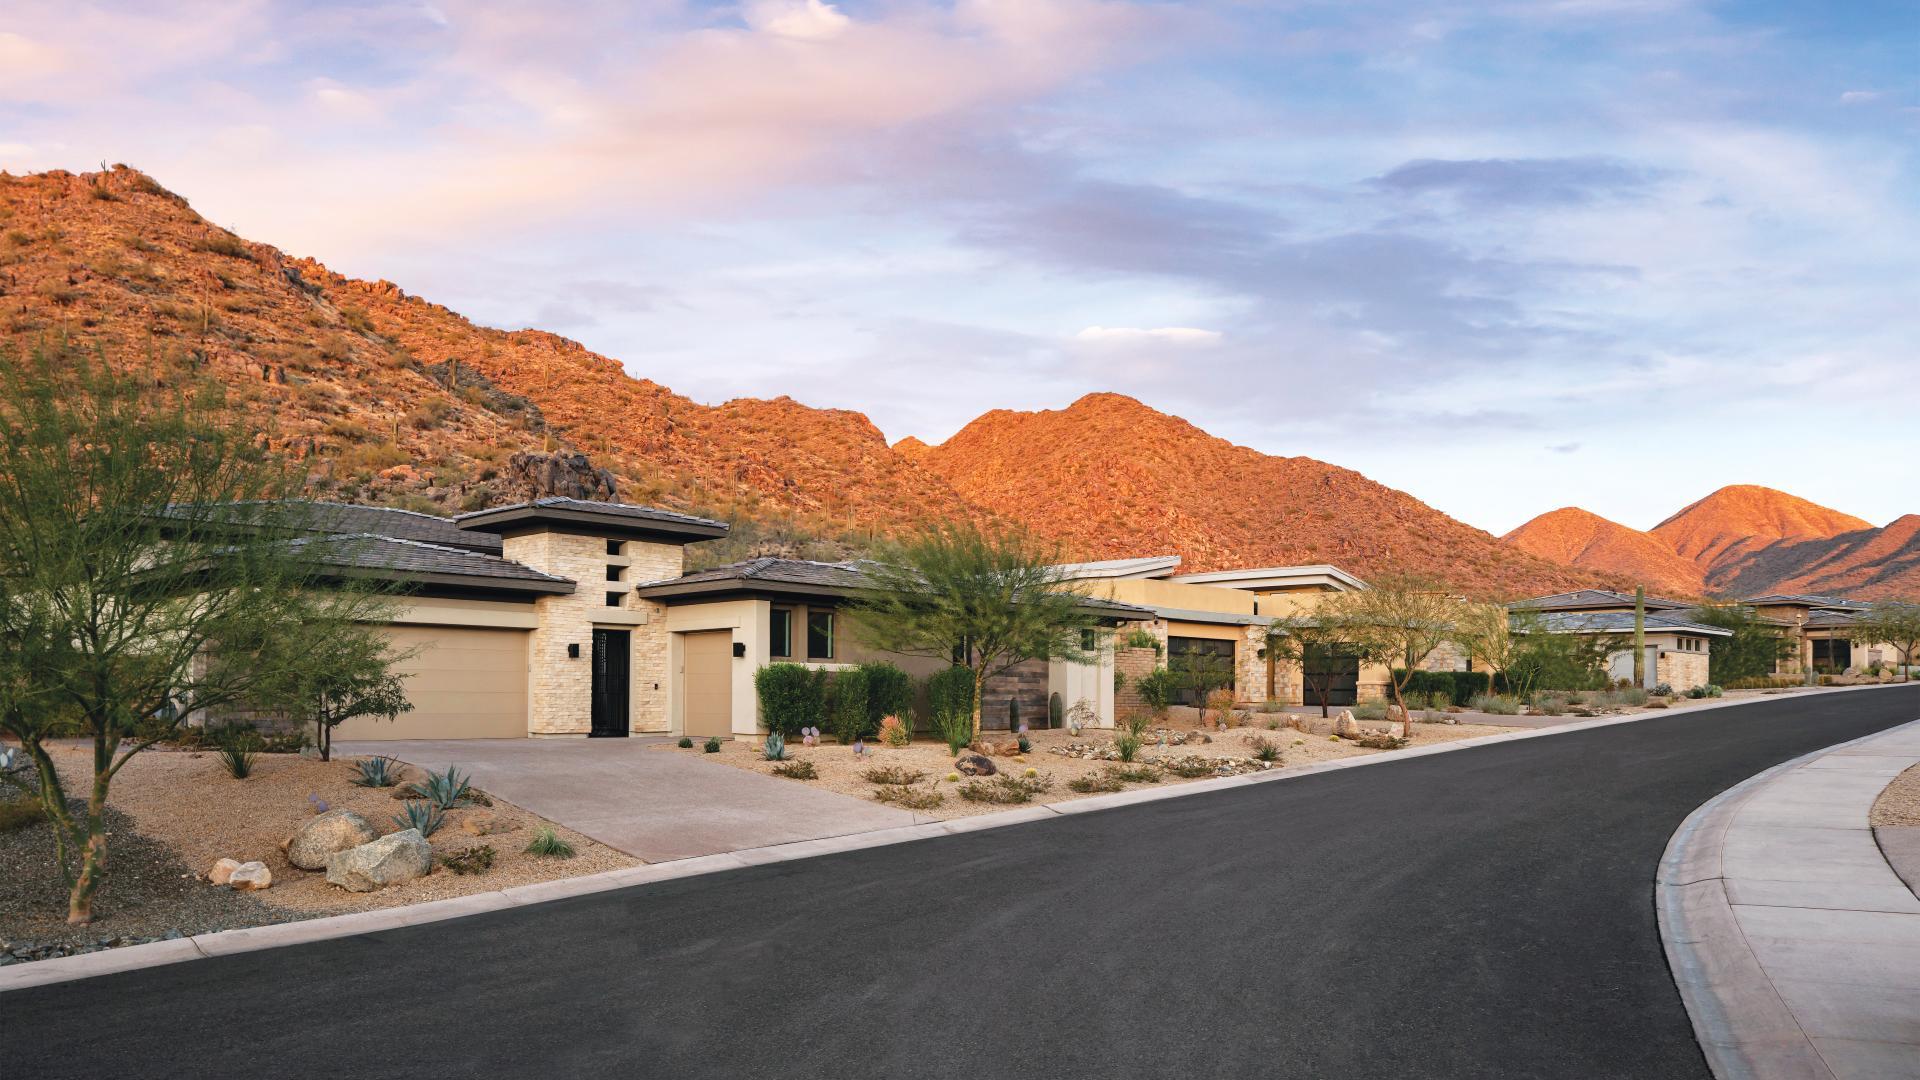 Award-winning private community with beautiful canyon views